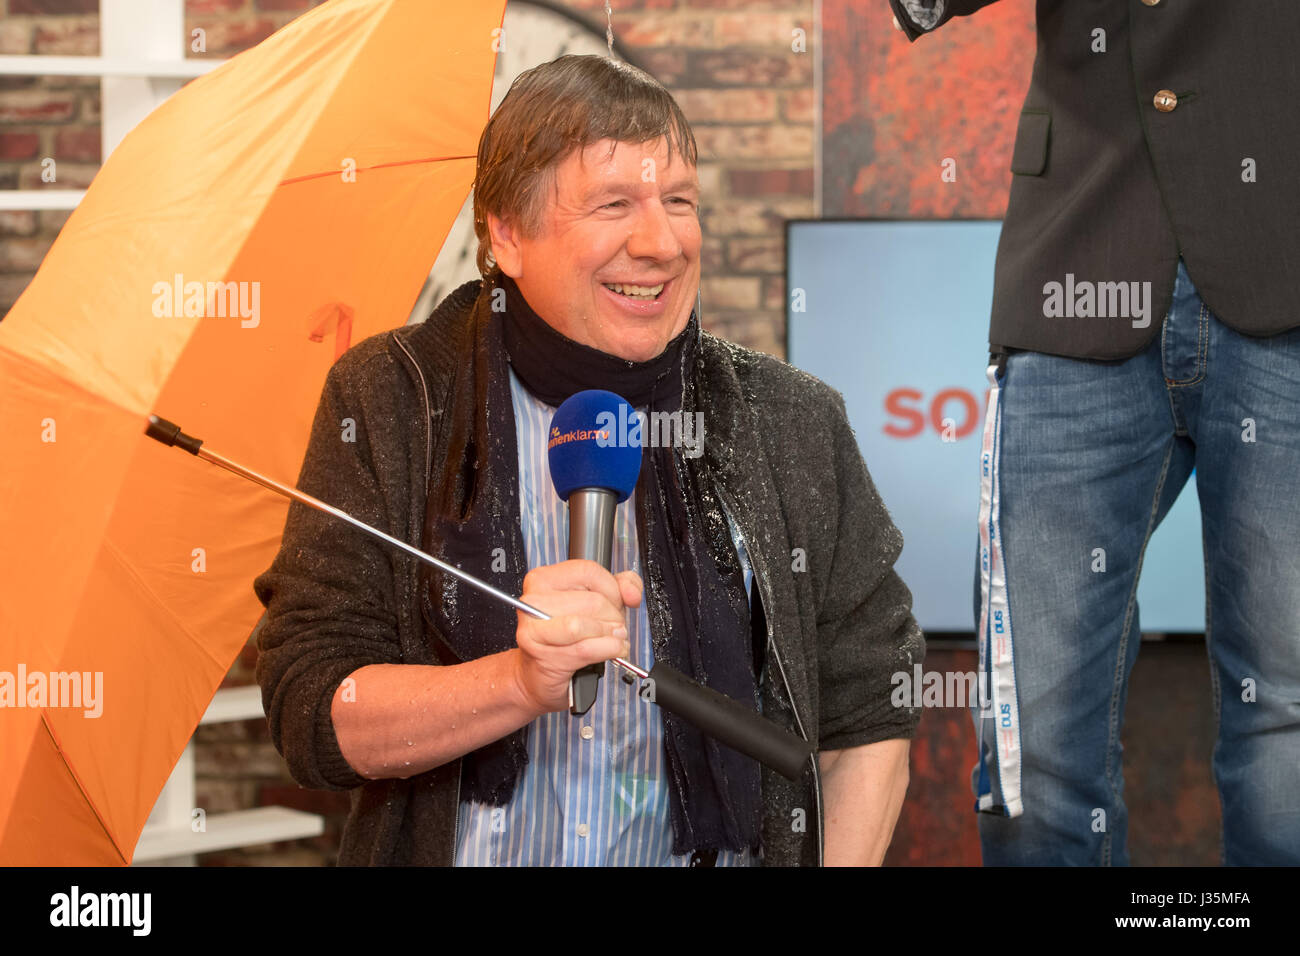 Munich, Germany. 03rd May, 2017. Weather presenter Jorg Kachelmann laughs at the TV studio of the sonnenklar.TV - Stock Image